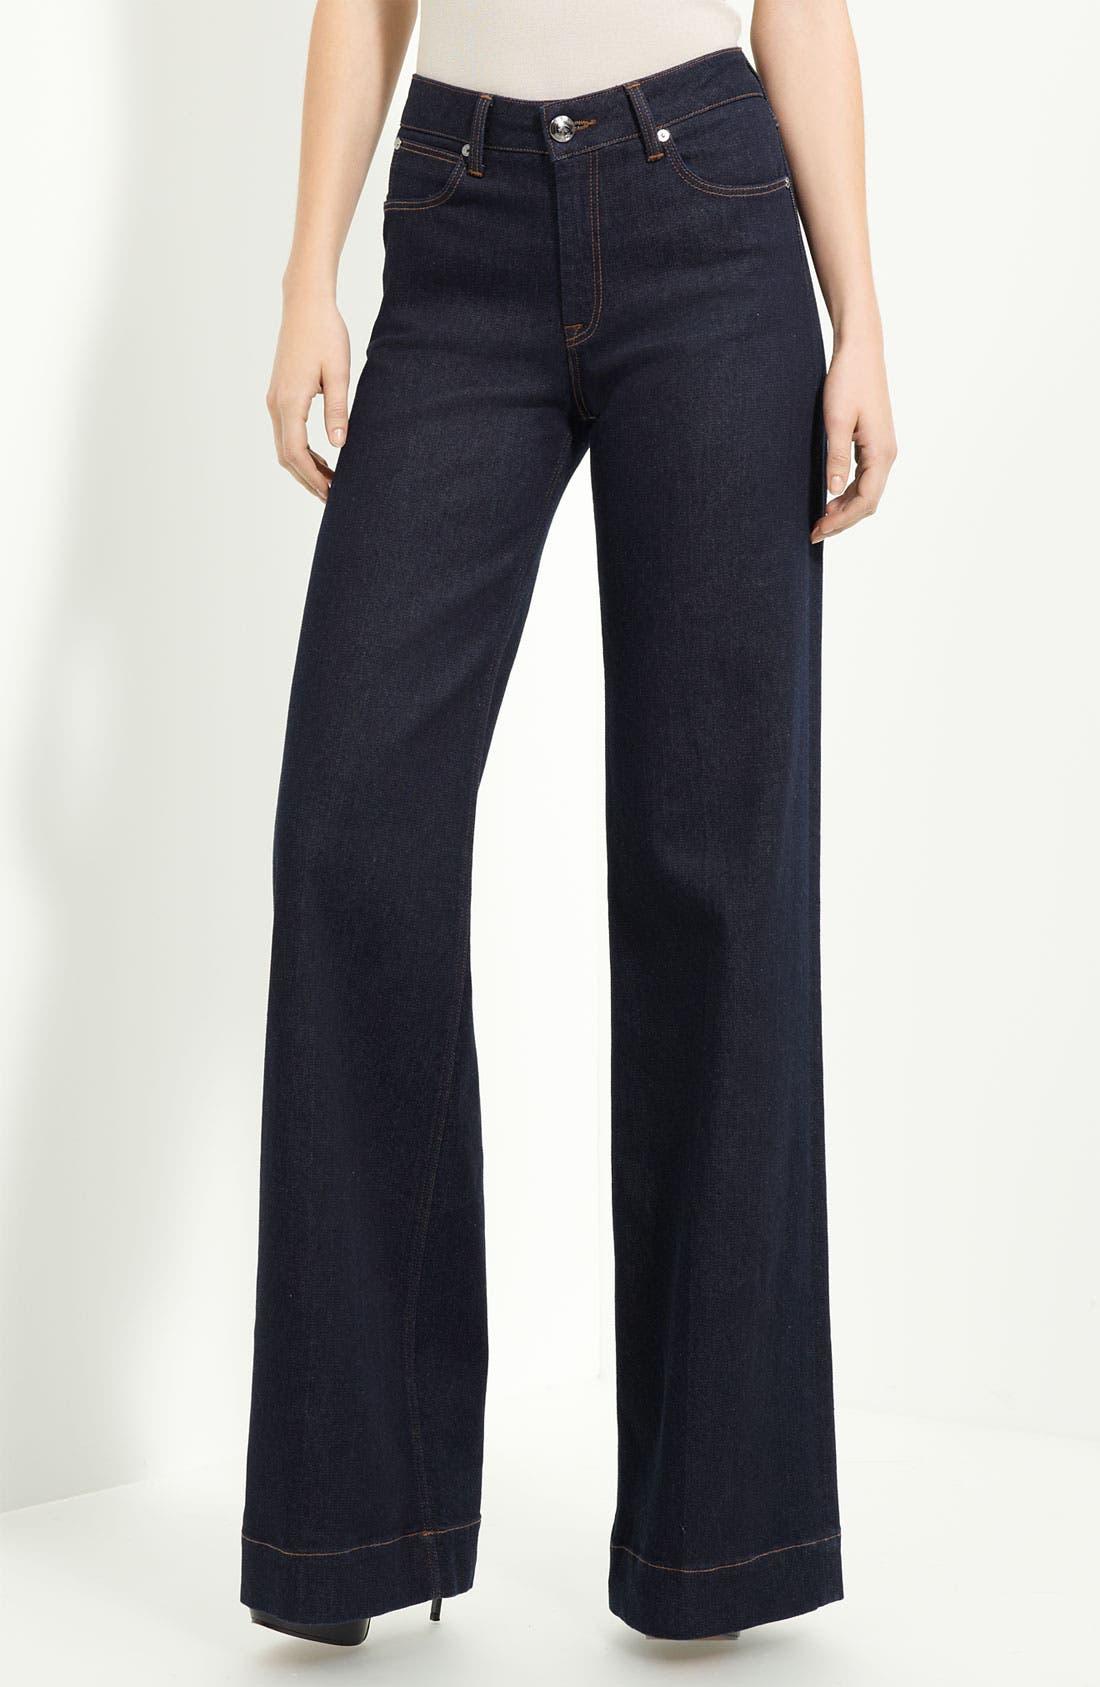 Alternate Image 2  - Burberry London Wide Leg Stretch Jeans (New London Rinse)